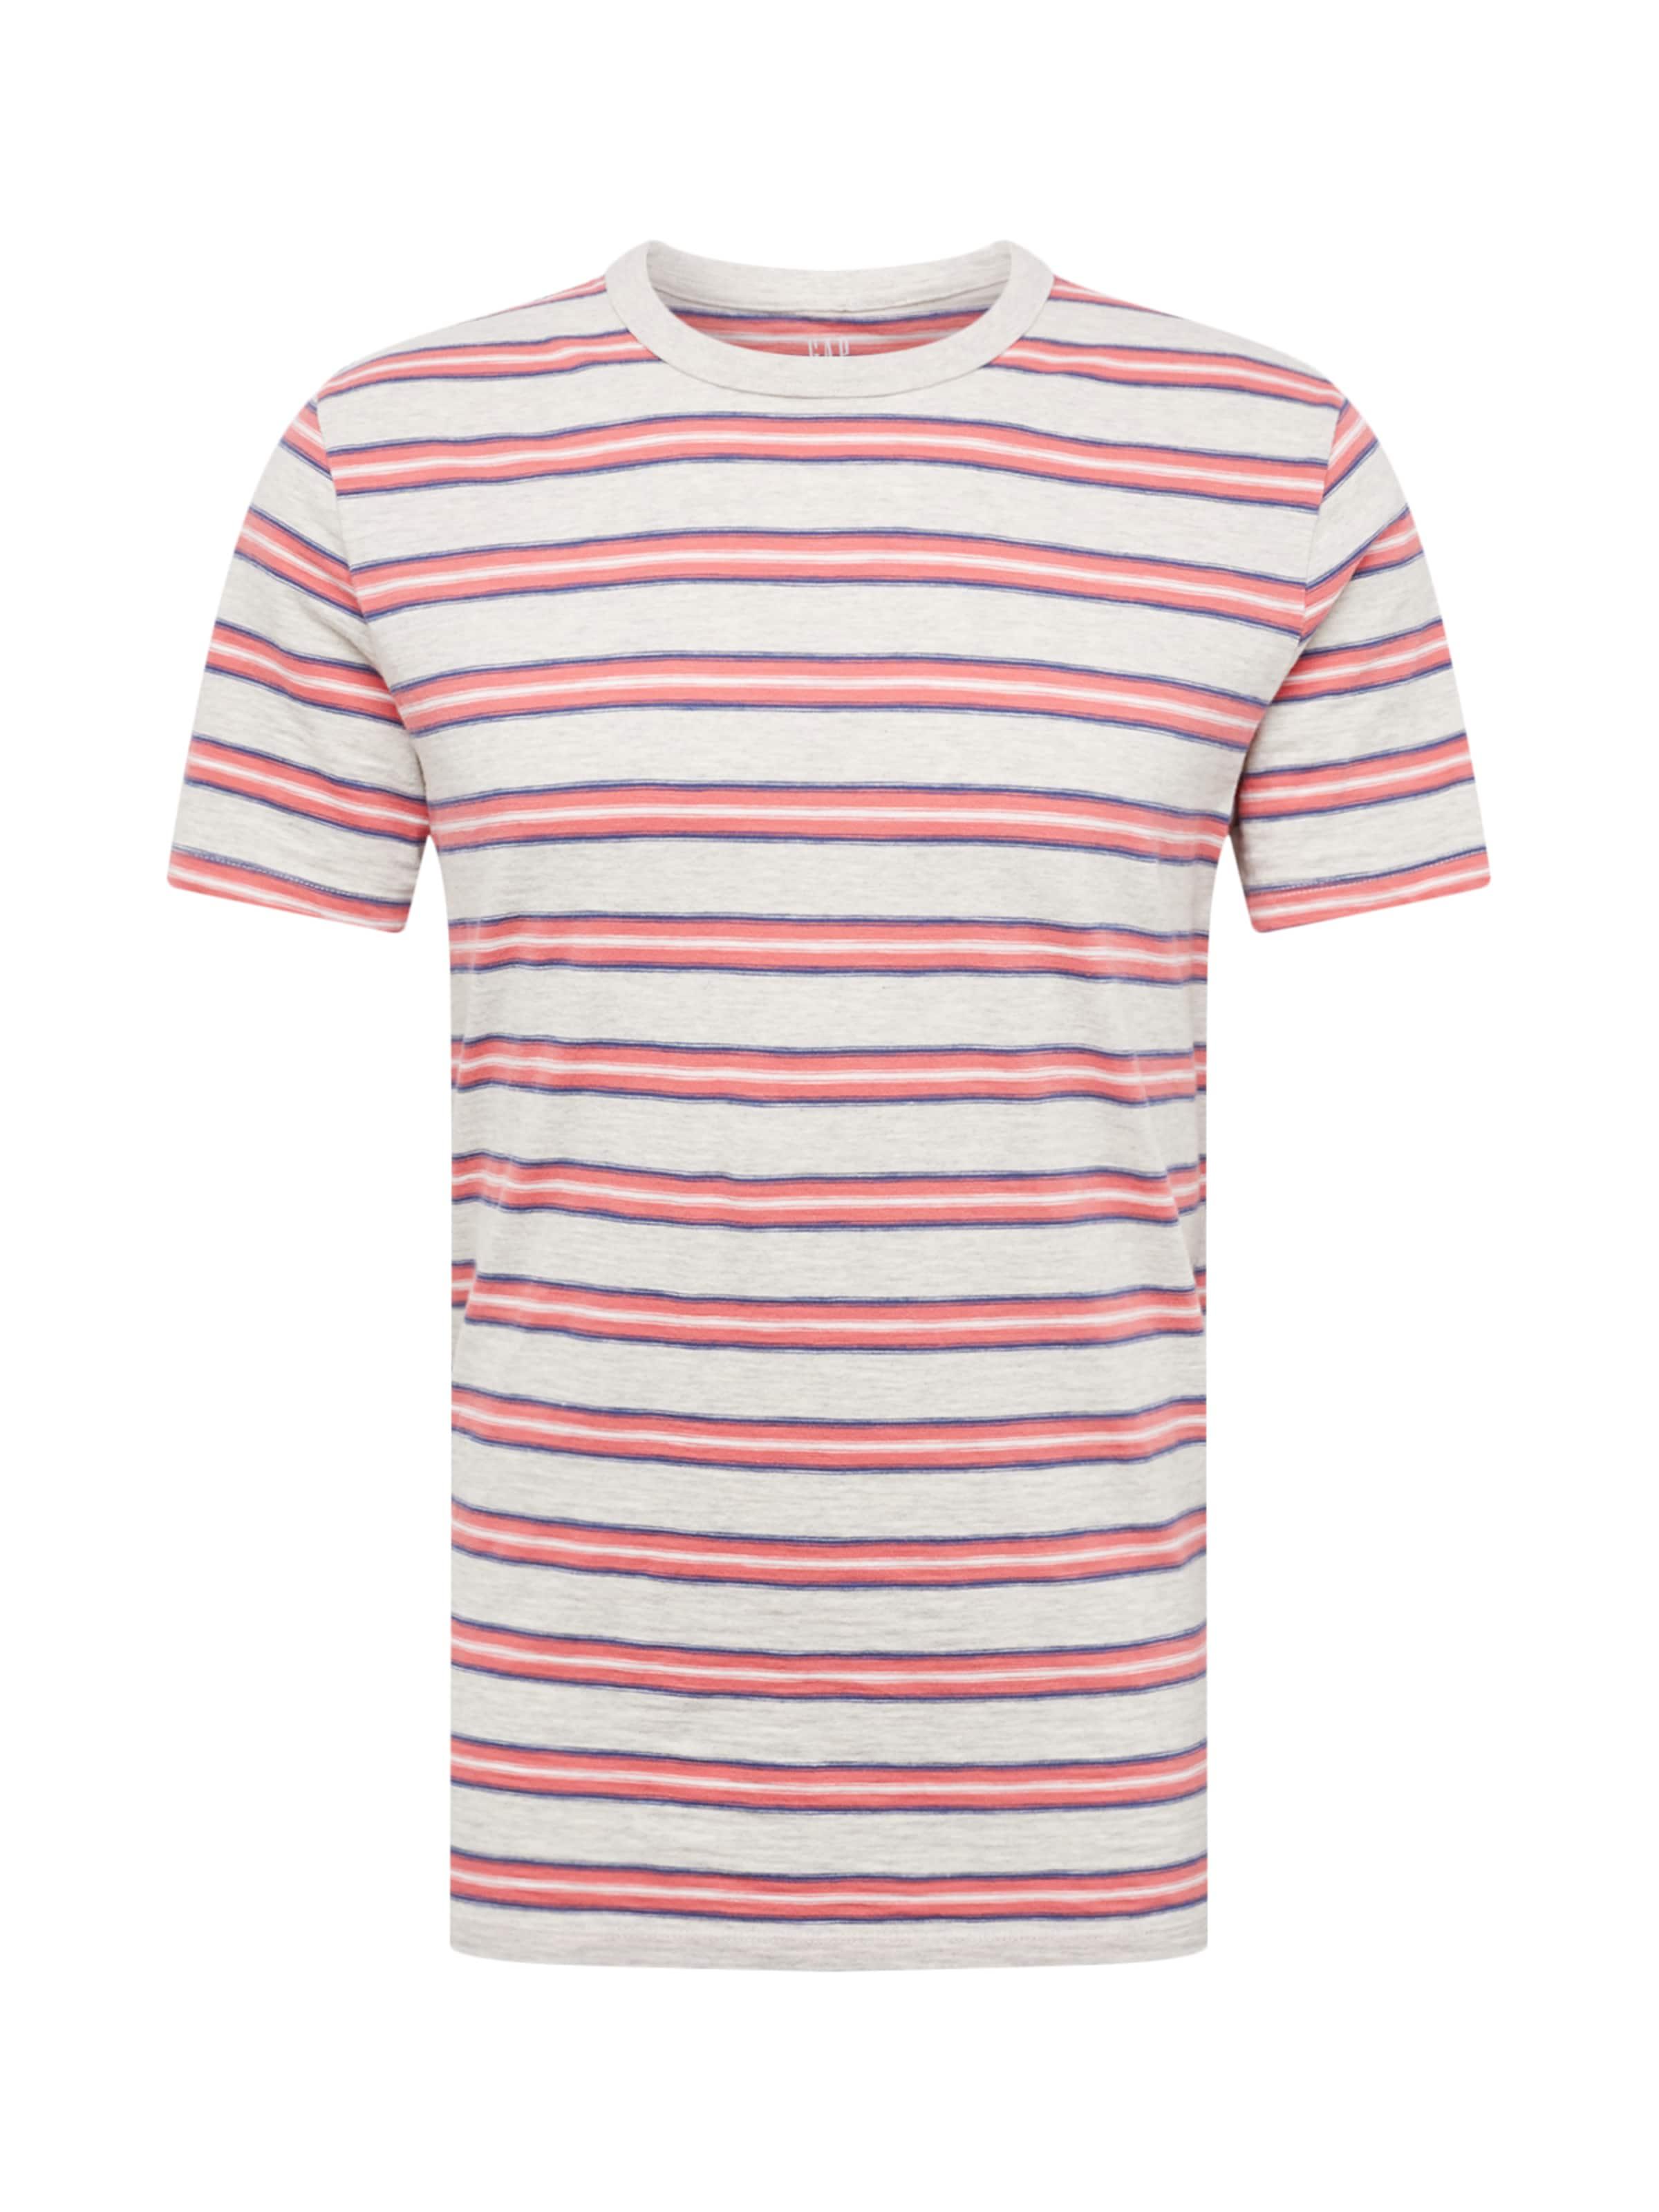 Stripe' 'ss T GrisRouge Gap shirt Slub En Rq35S4AjcL